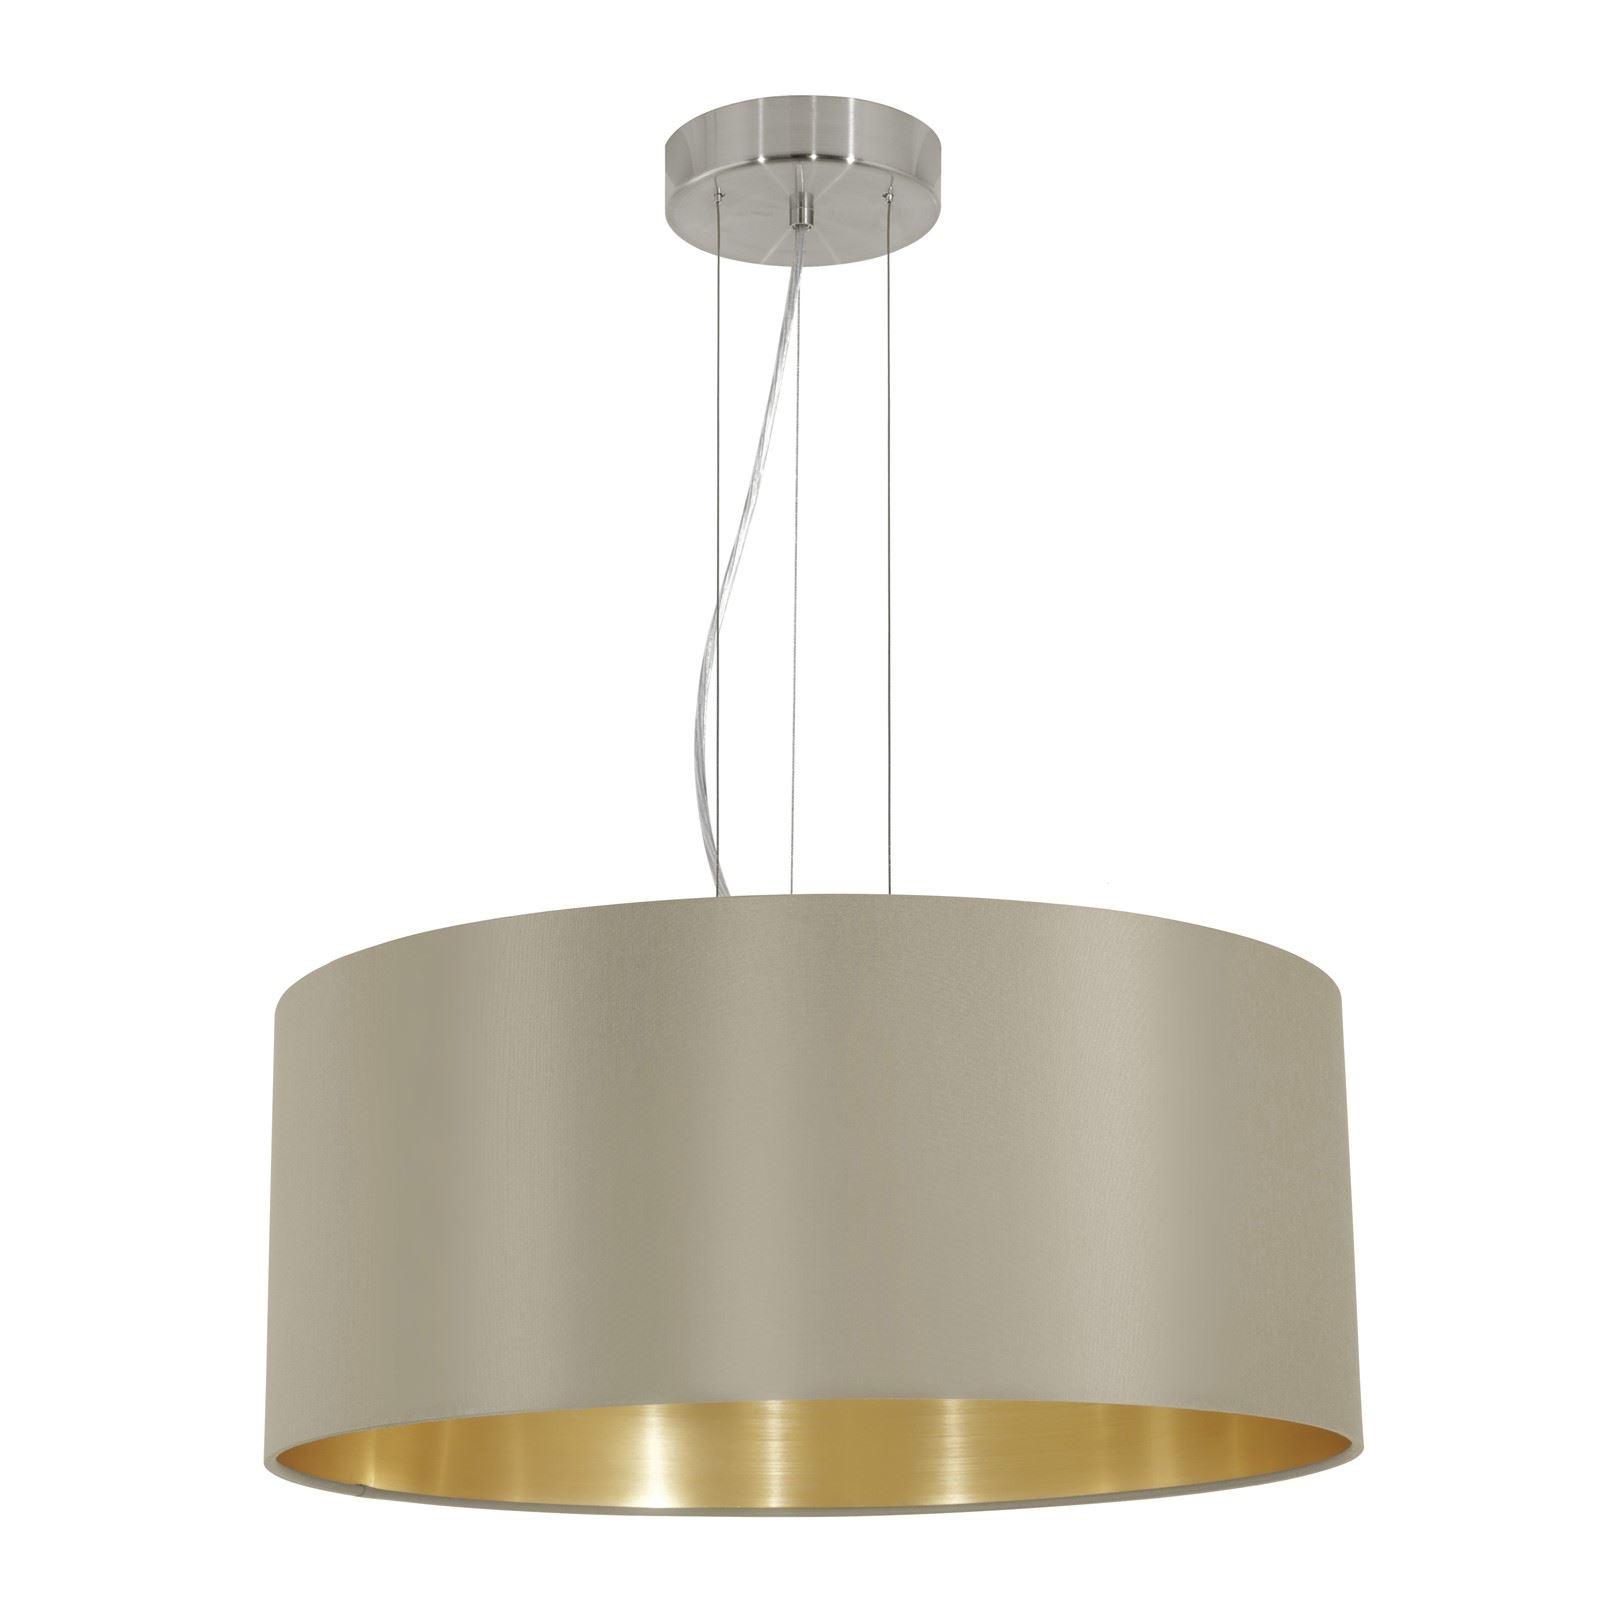 Maserlo Steel Hanging 3 Light Satin Nickel Fabric Matt Taupe Shade